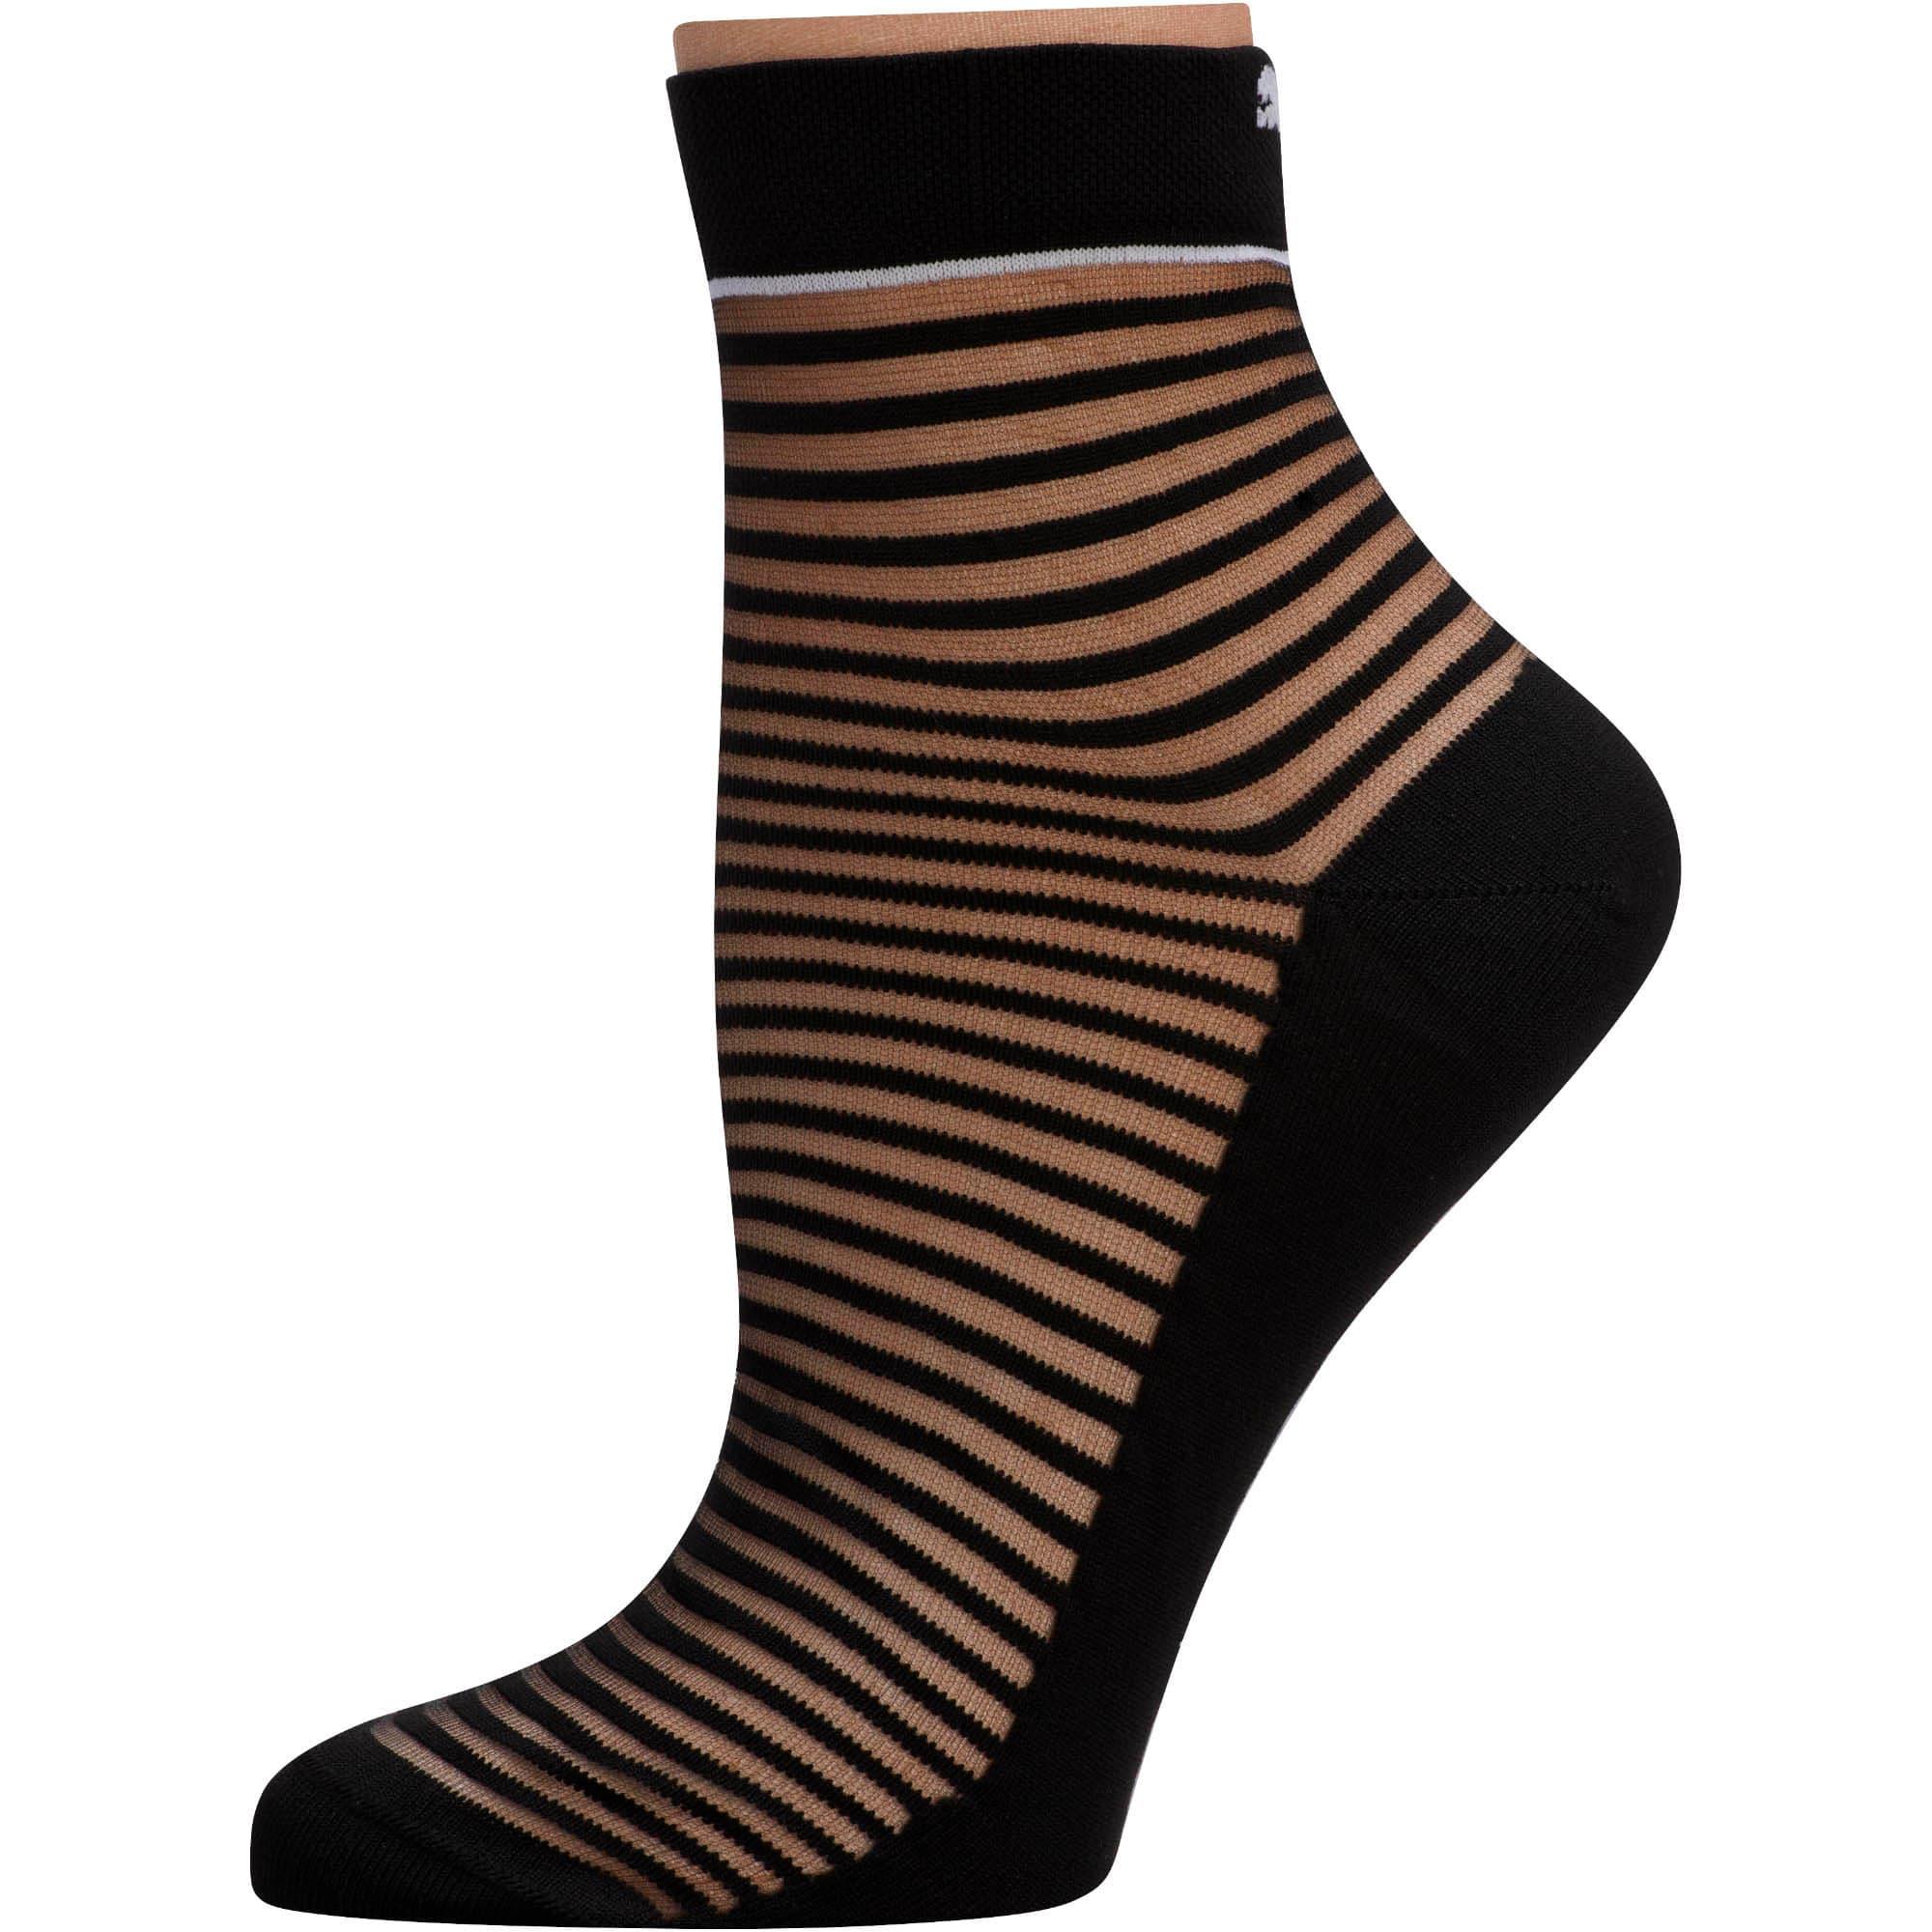 Thumbnail 1 of SG x PUMA Transparent Short Socks [1 Pair], Black, medium